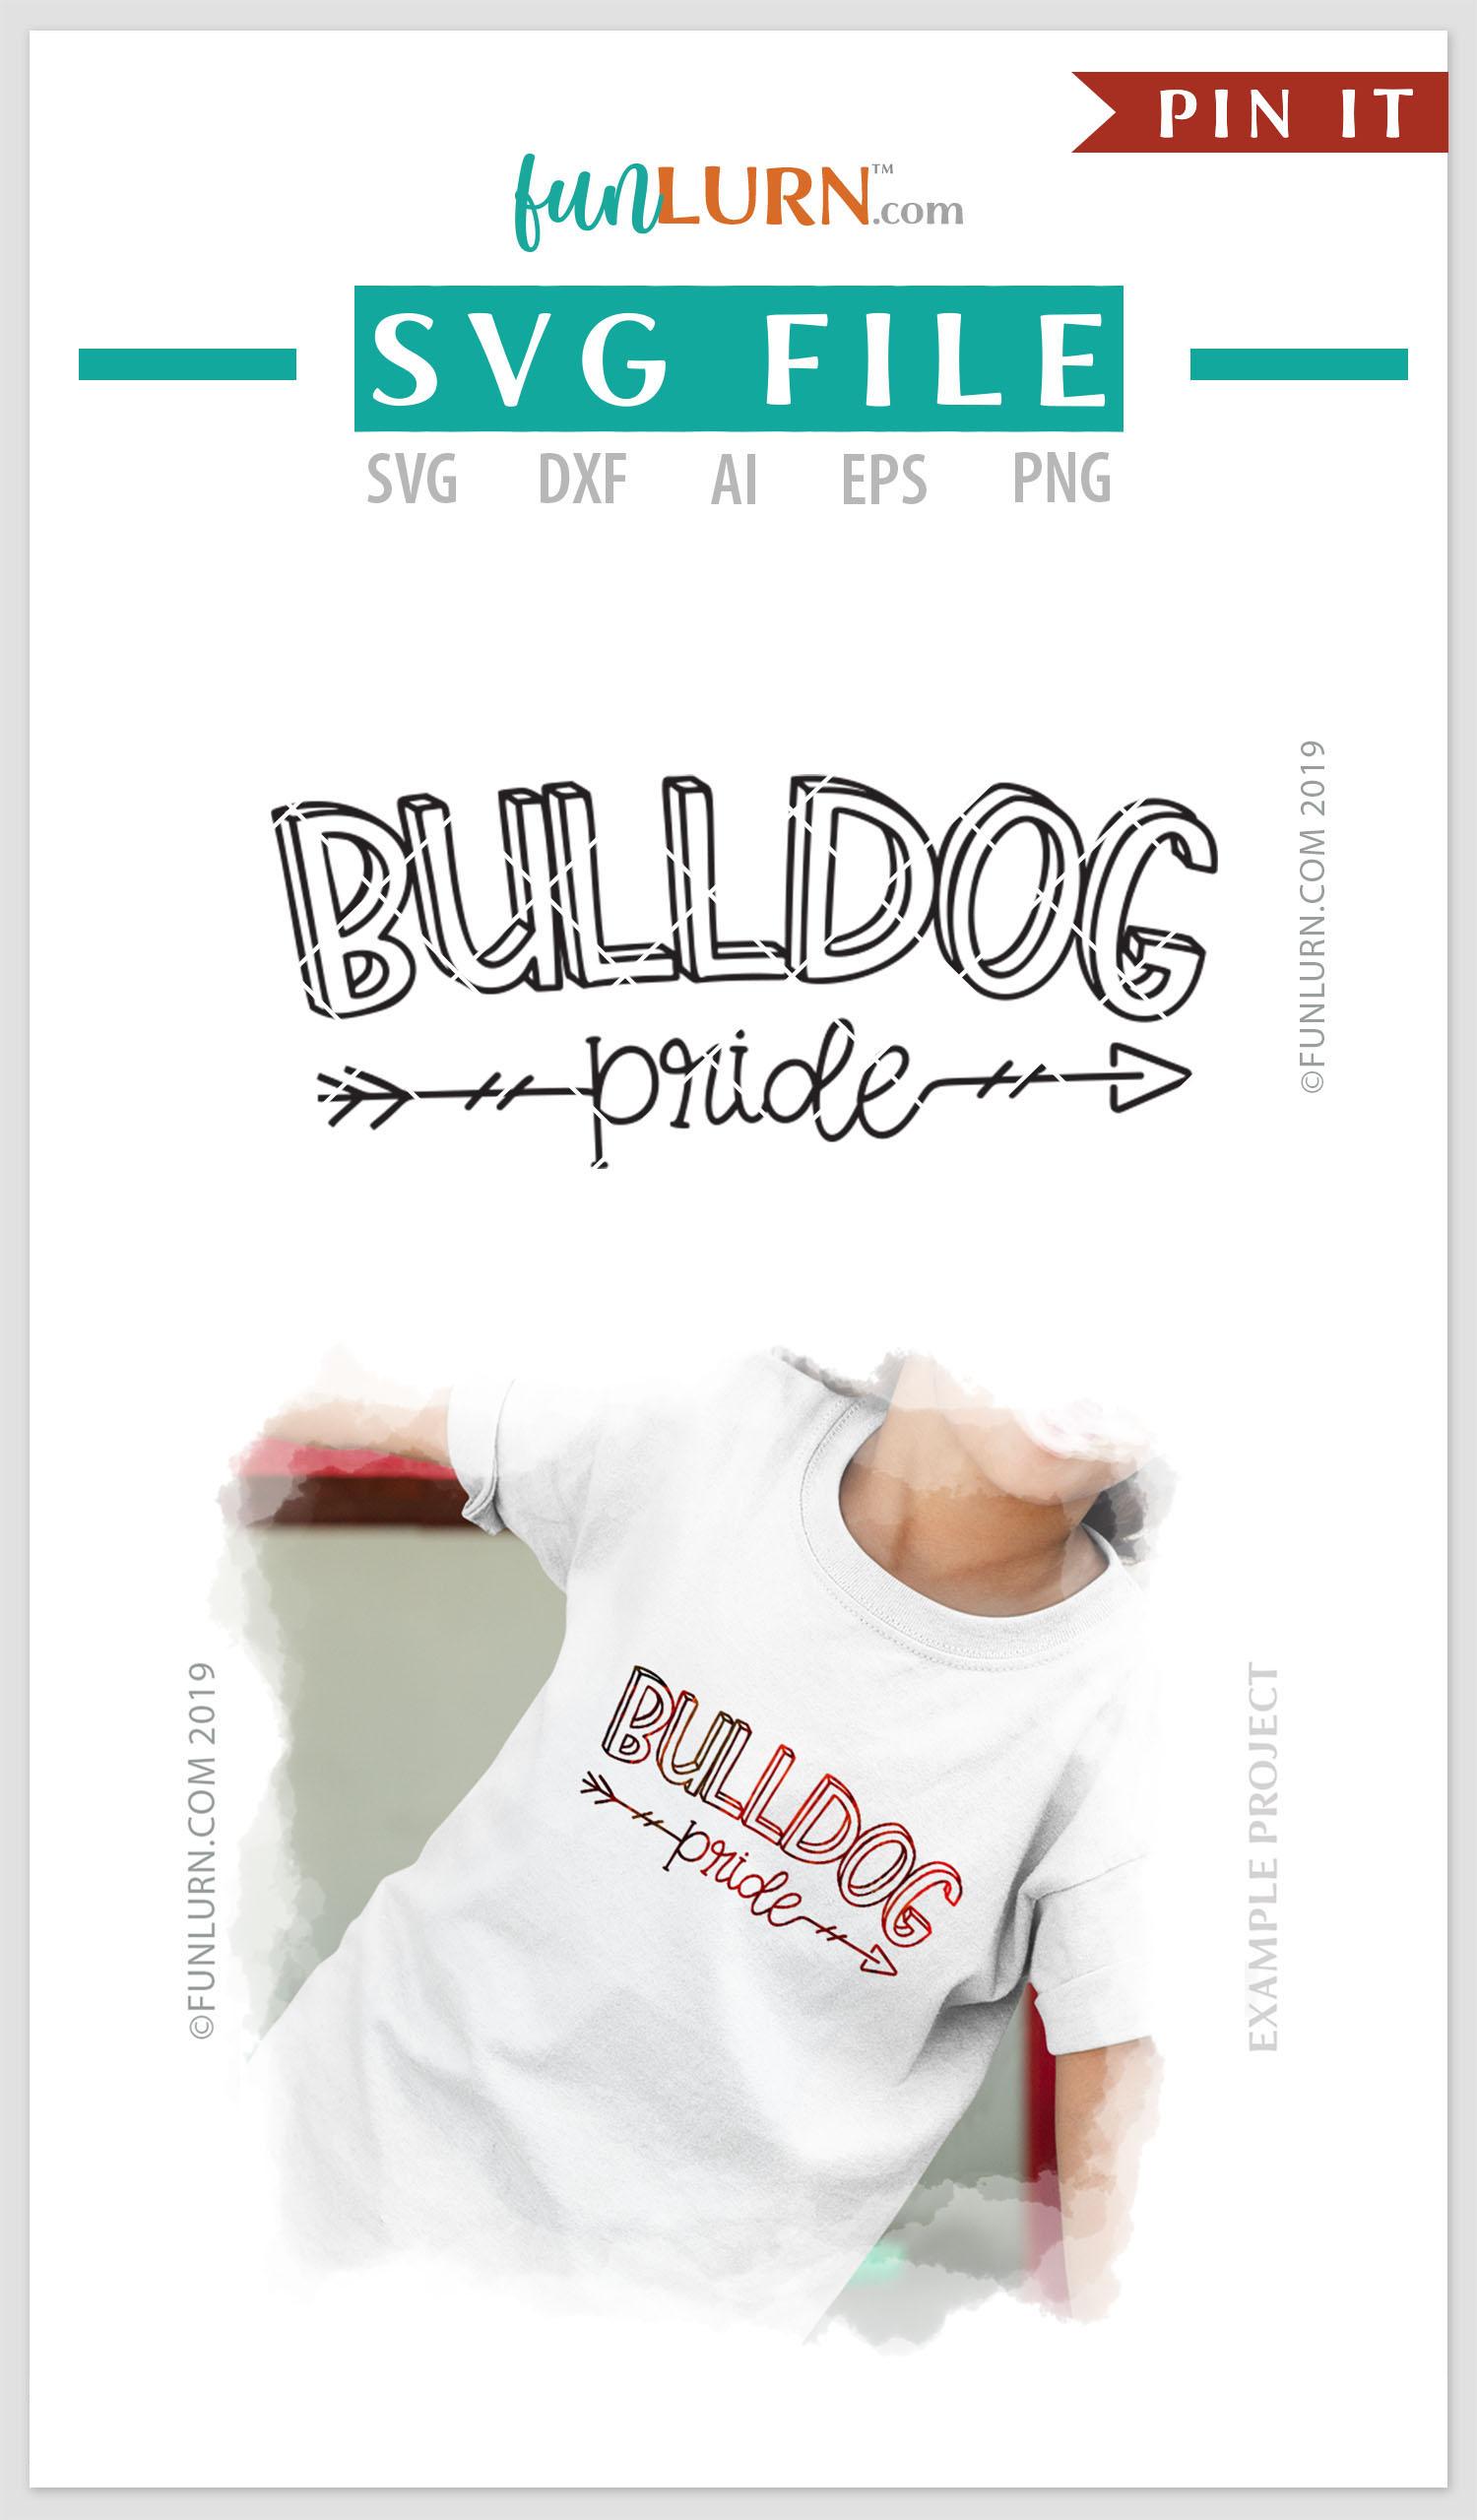 Bulldog Pride Team SVG Cut File example image 4